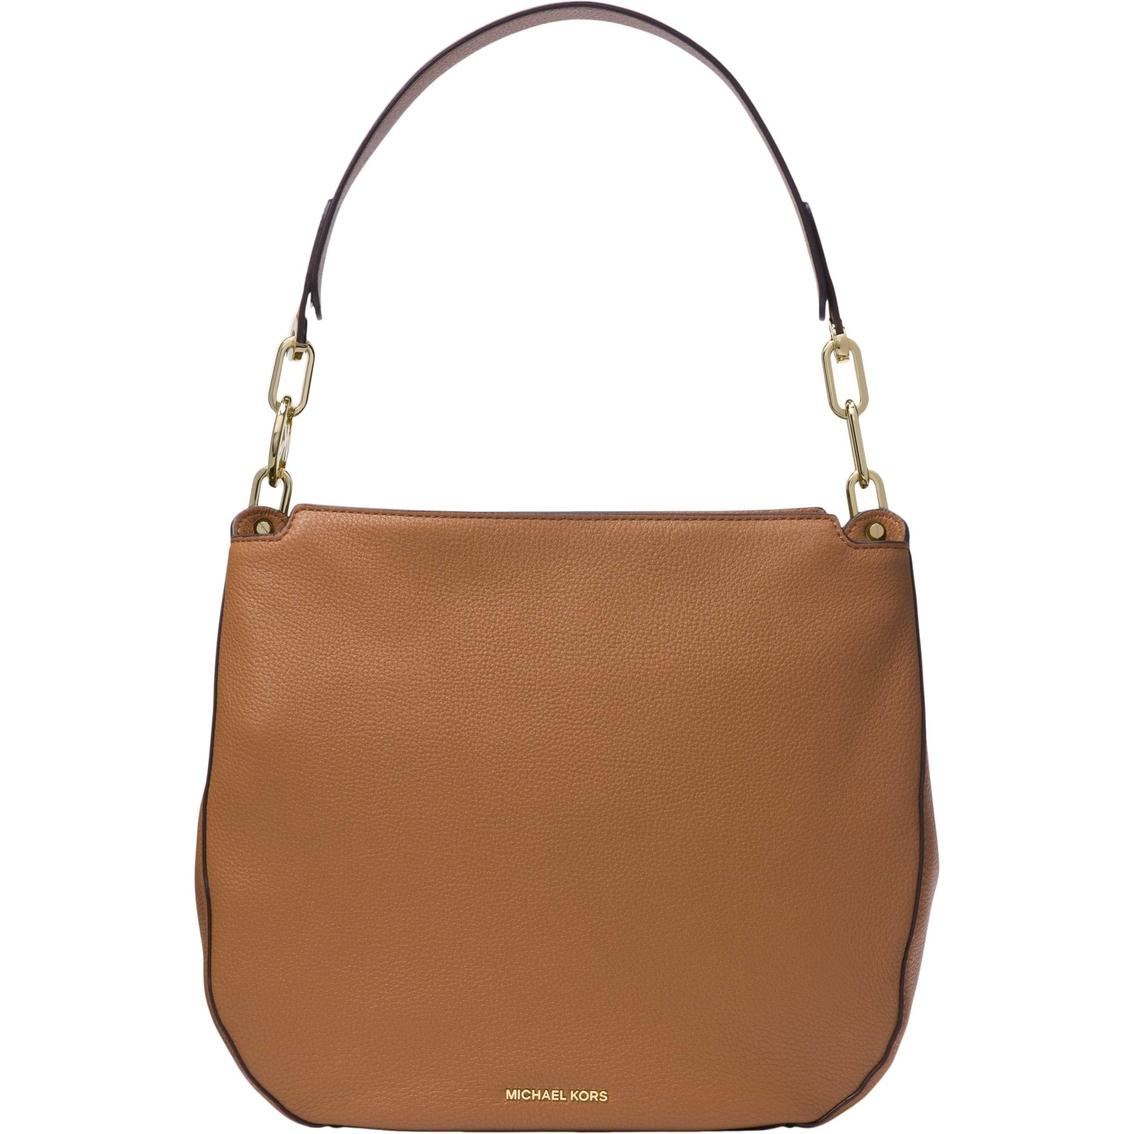 f8fa347a6b90 Michael Kors Fulton Large Hobo Handbag Leather | Hobo Bags ...